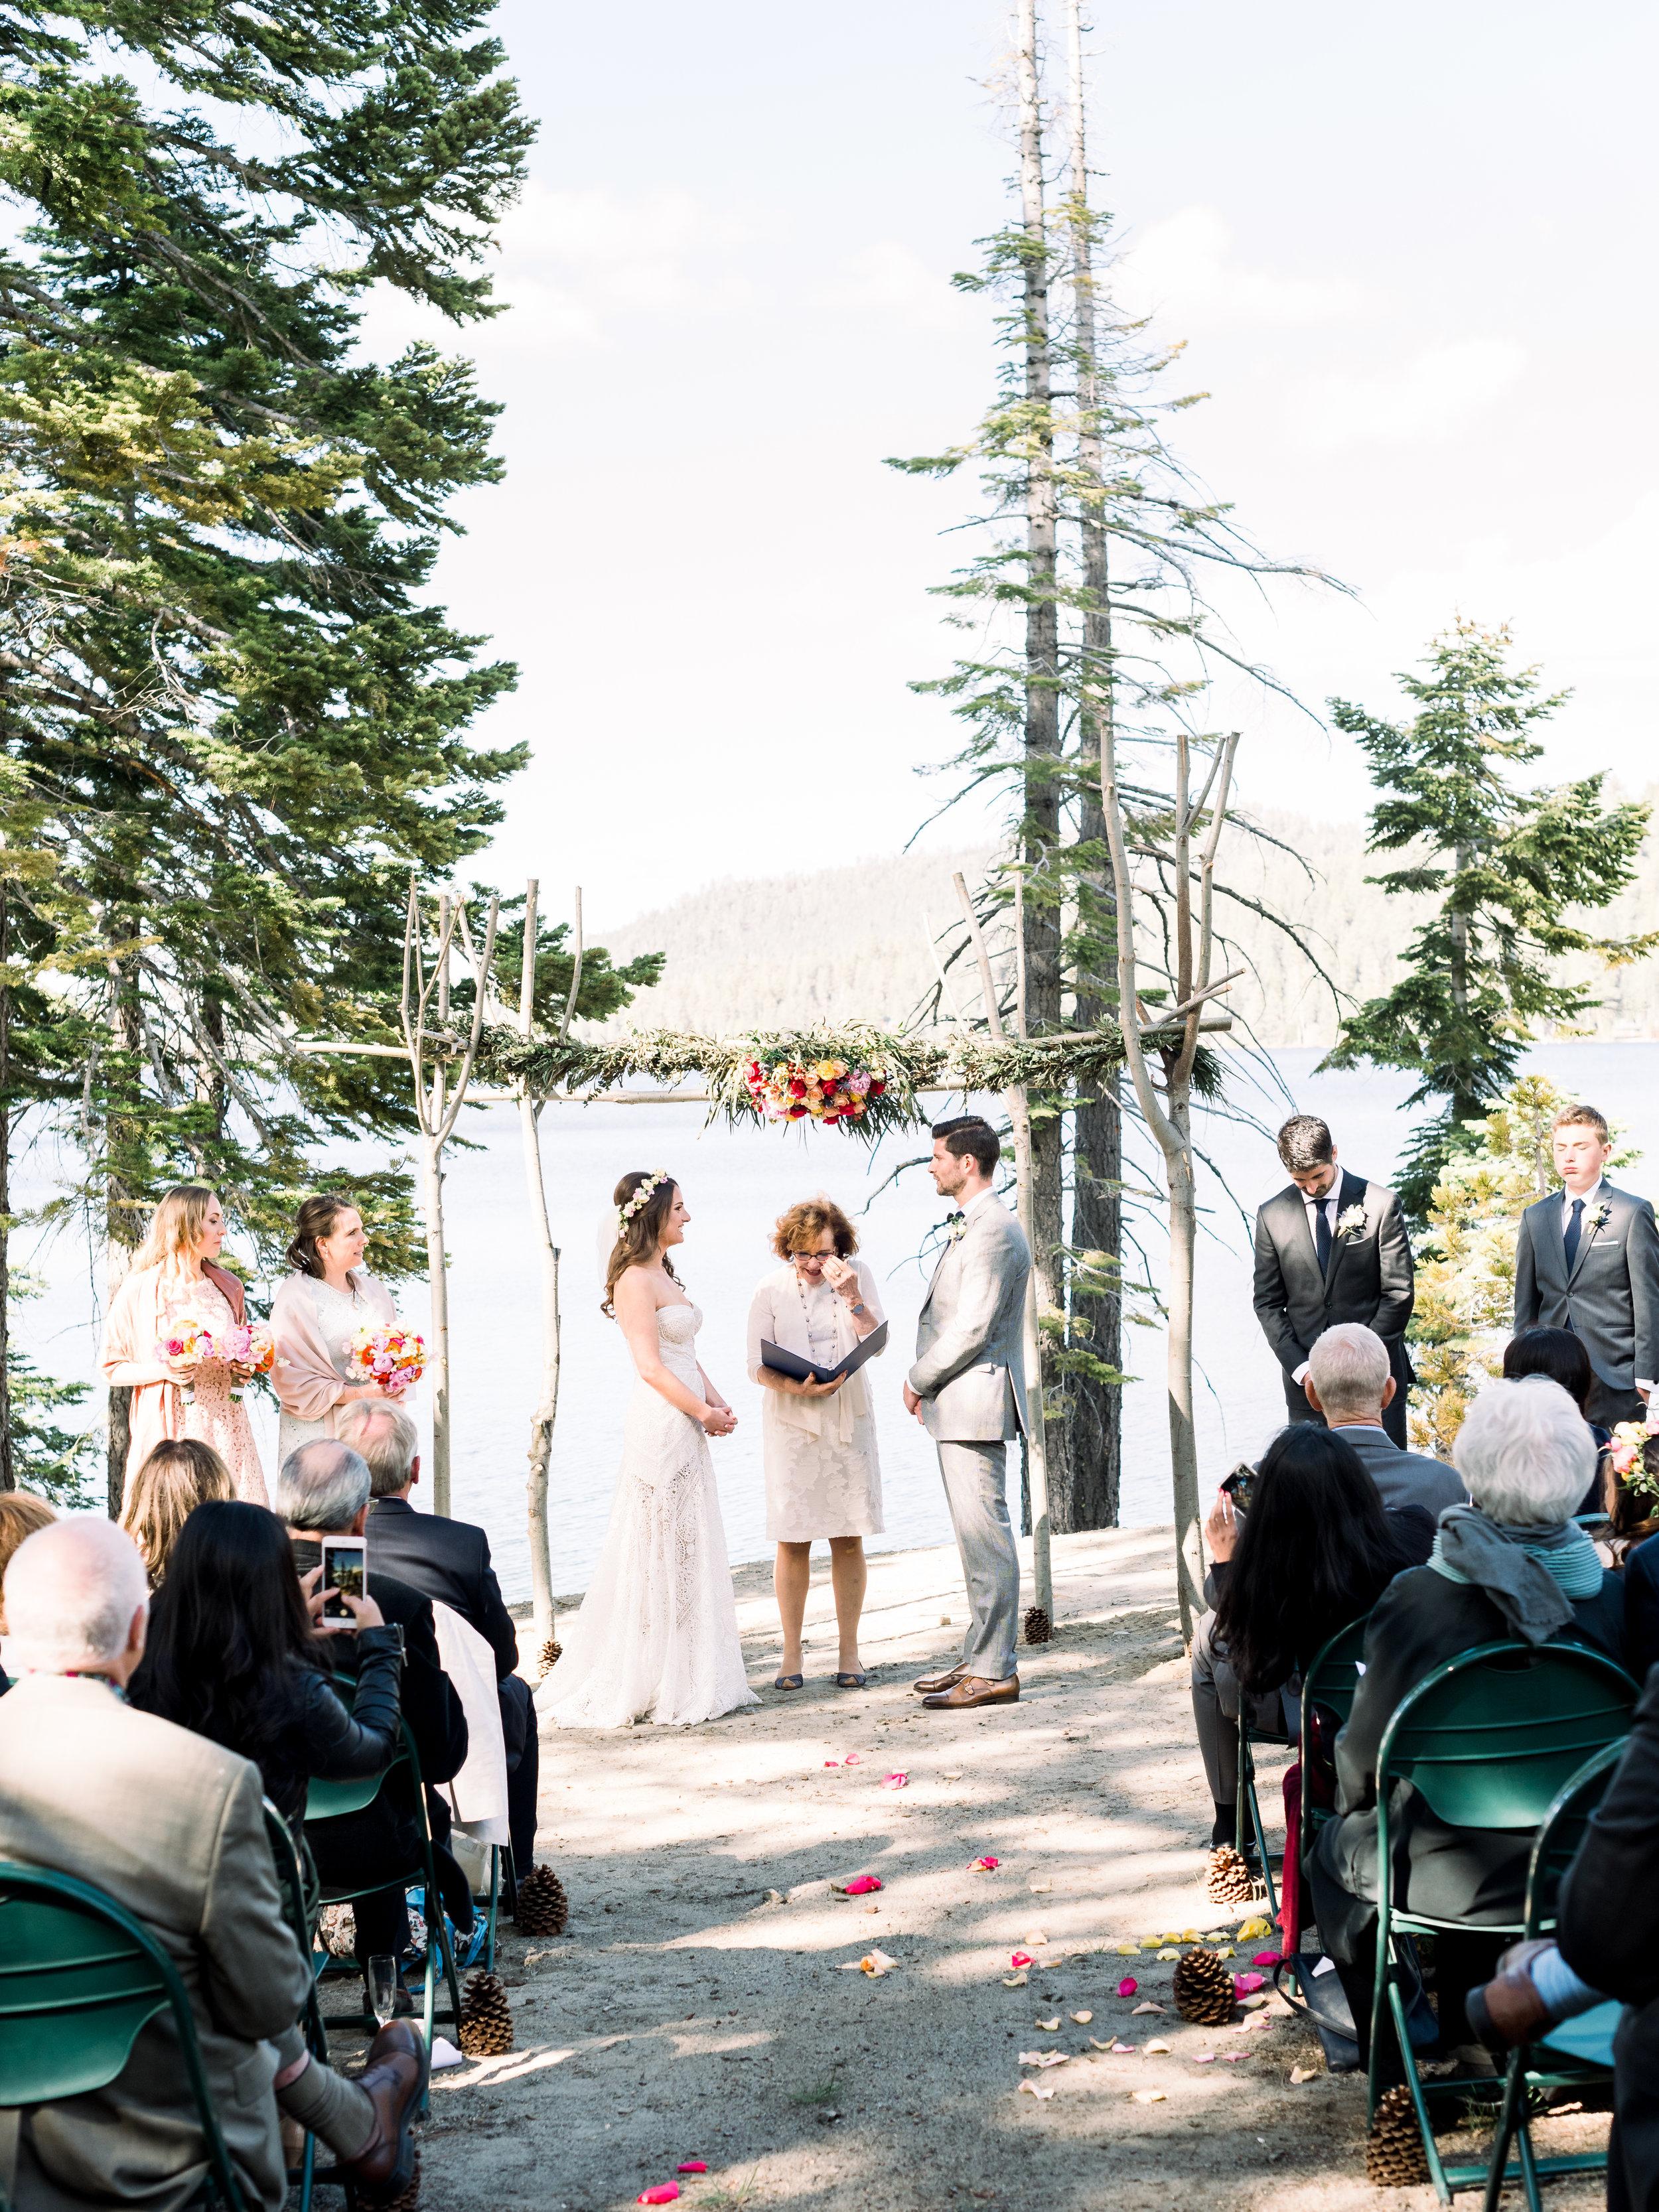 wedding-ceremony-at-the-lake.jpg